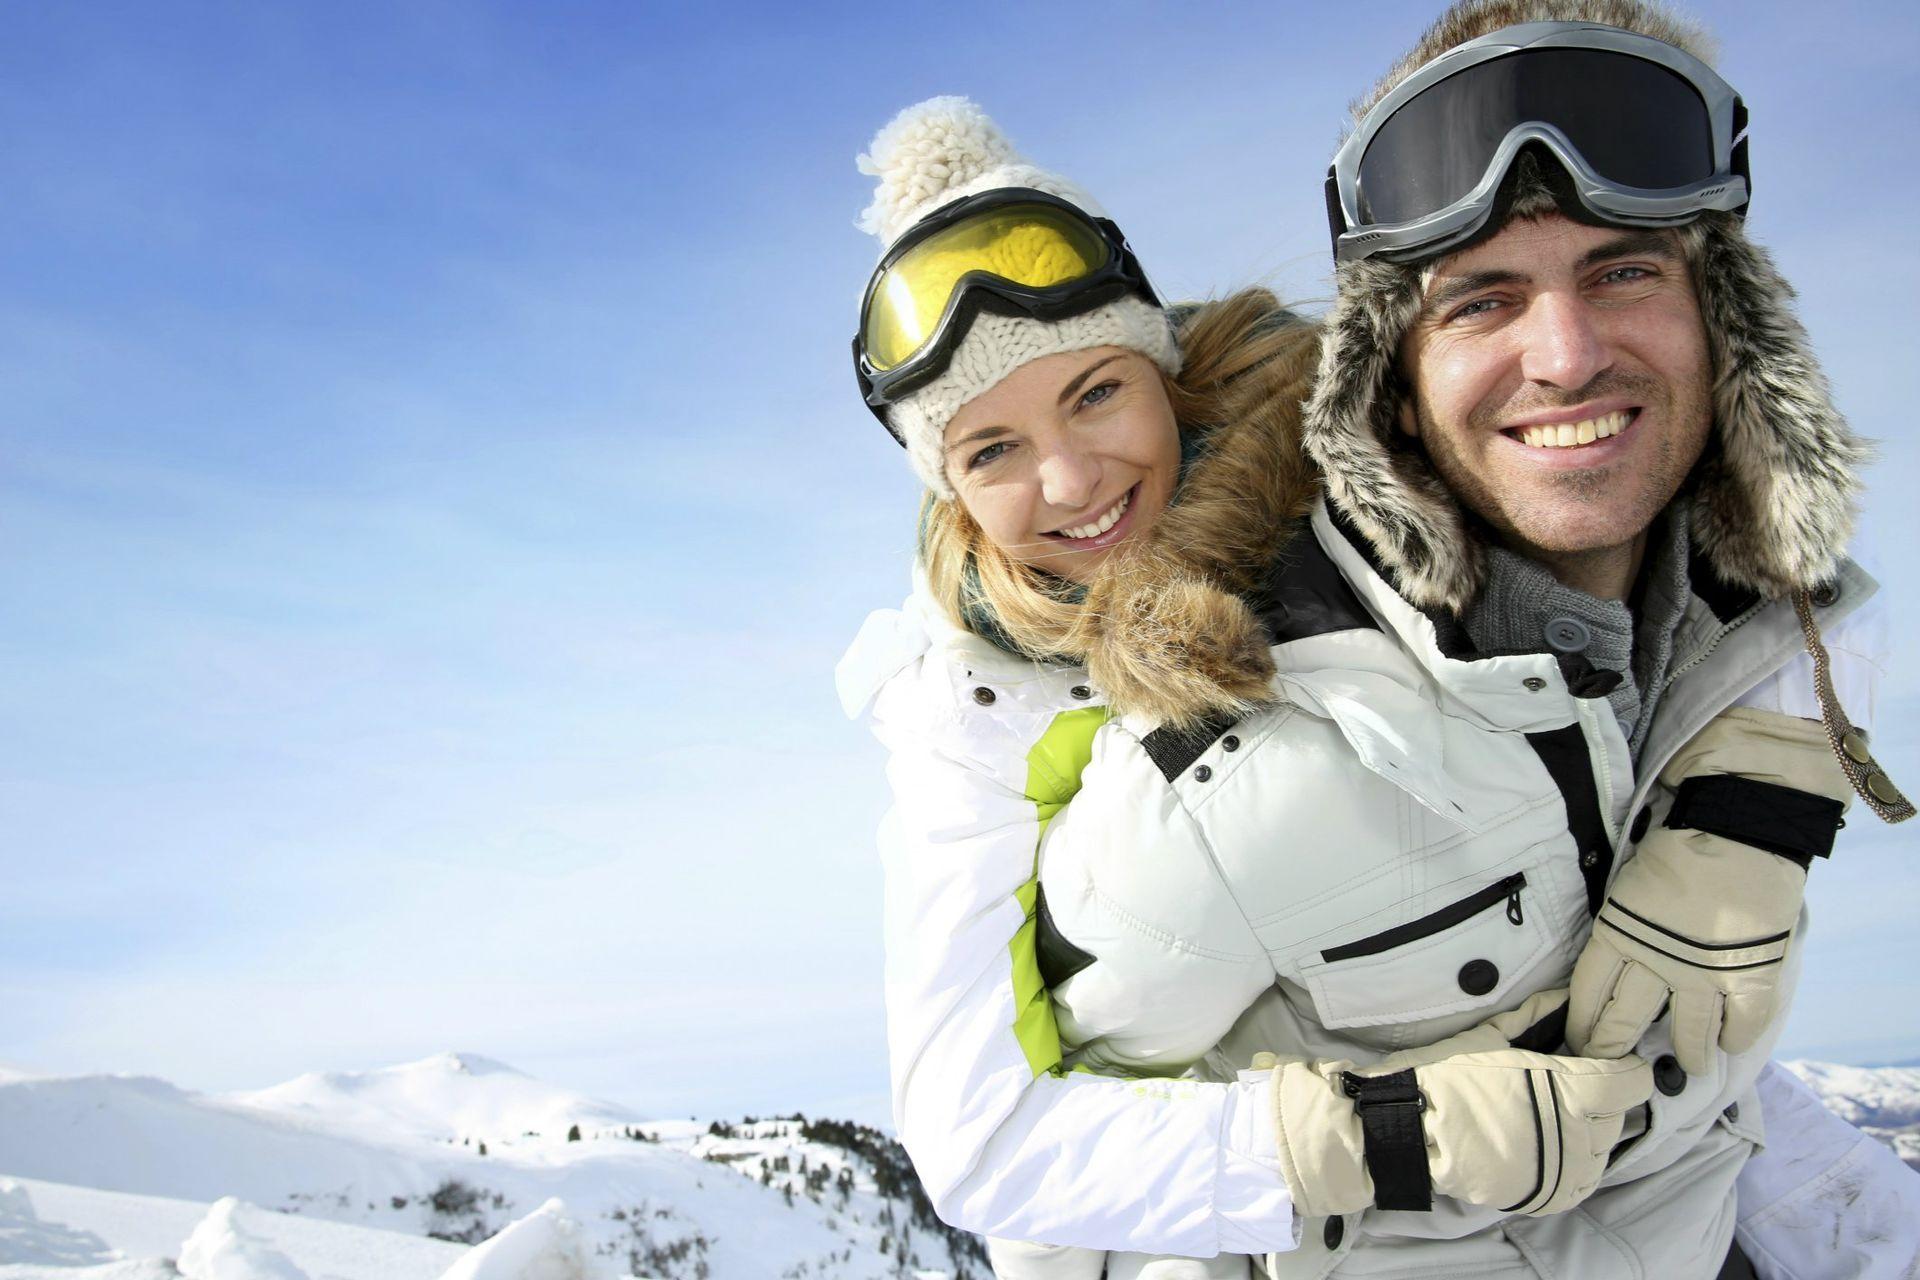 happy-skiing-couplevail-travel-couple